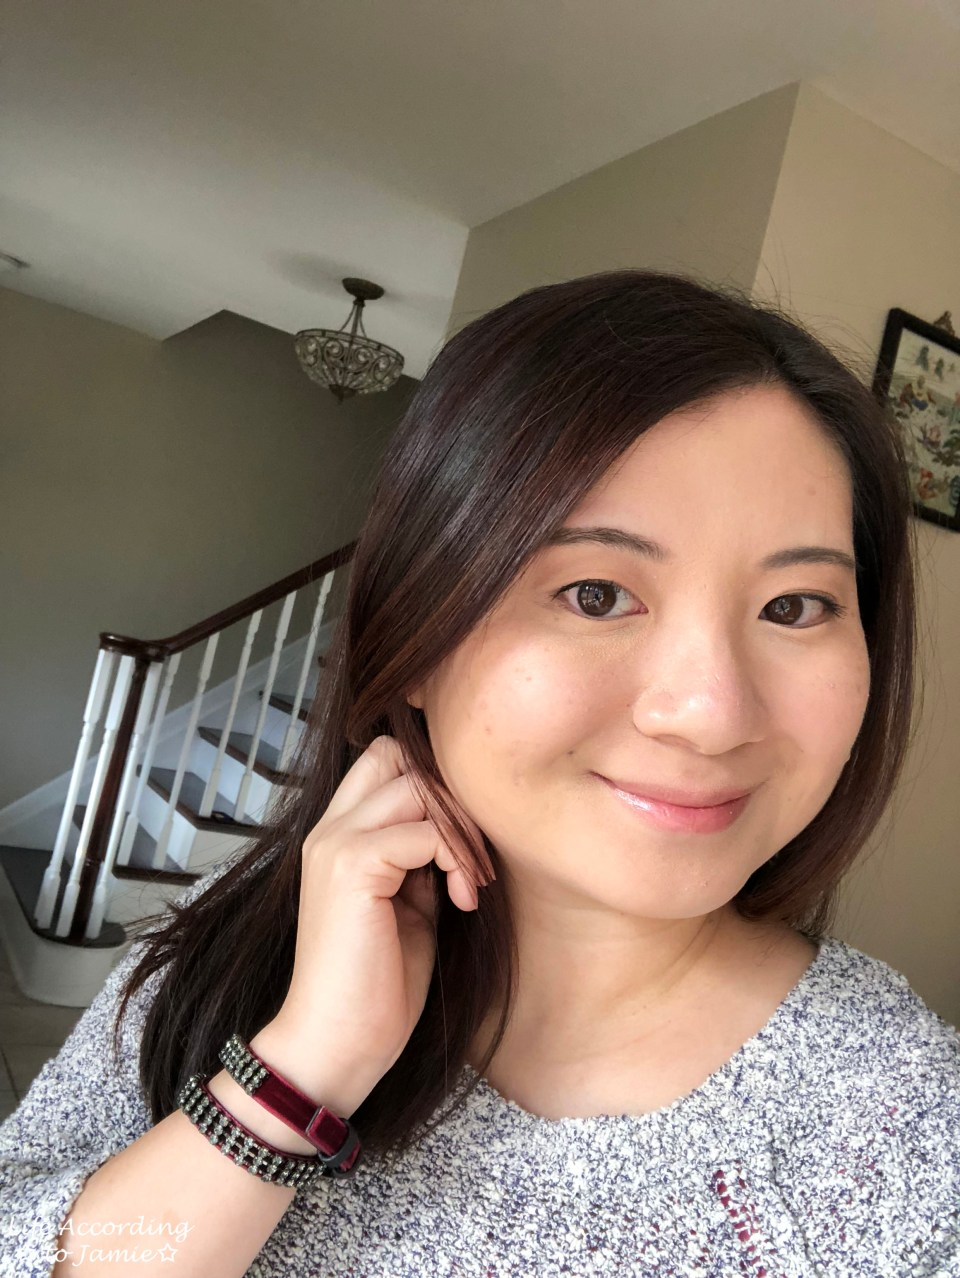 Becca x Chrissy - Glow Face Palette selfie 1